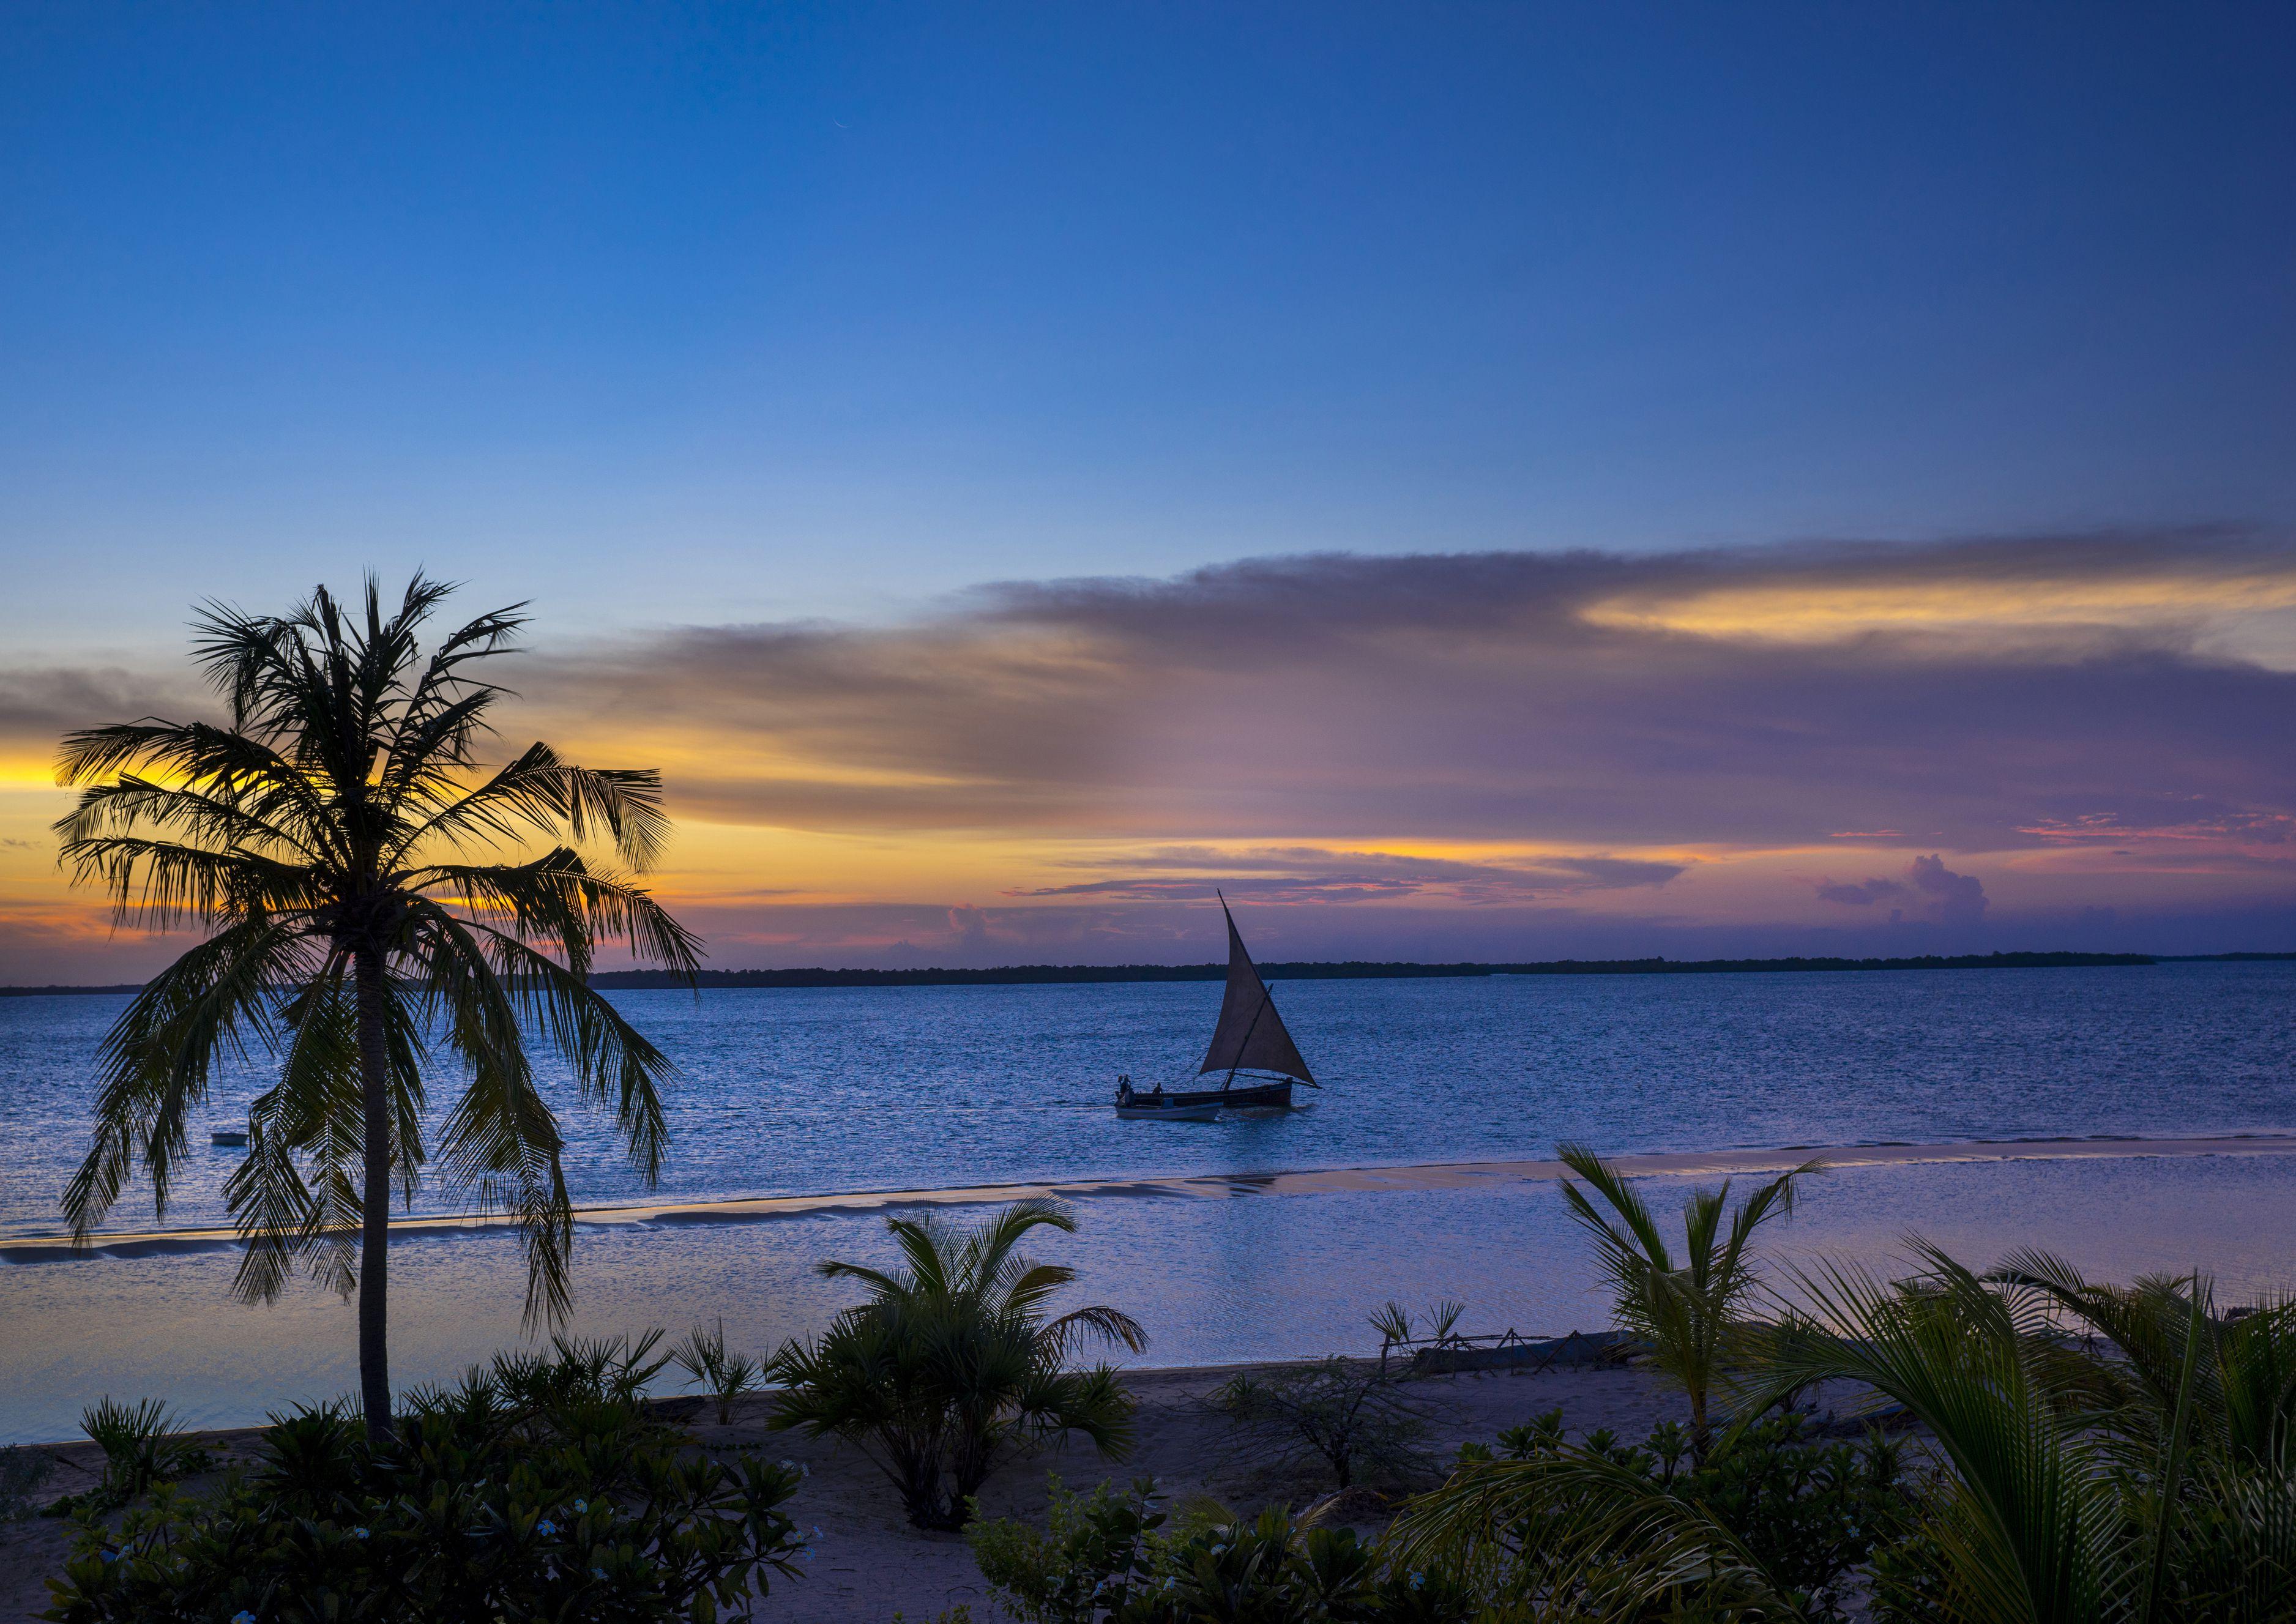 Kenya, Lamu County, Kizingoni Beach, sunset on the beach